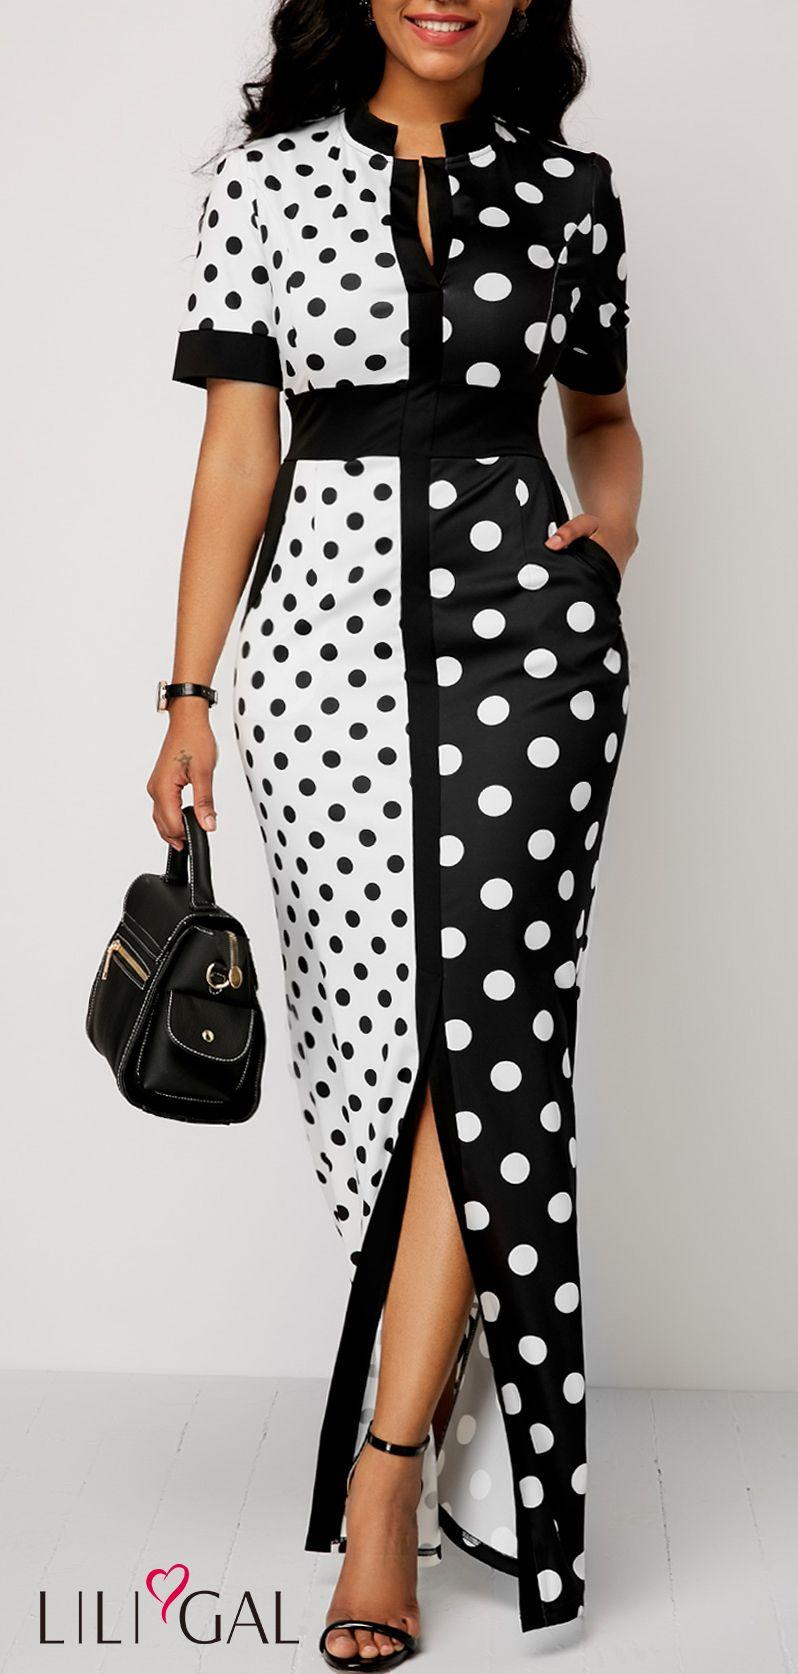 c4efe53f9d4 Front Slit Polka Dot Print High Waist Dress  liligal  dresses  womenswear   womensfashion